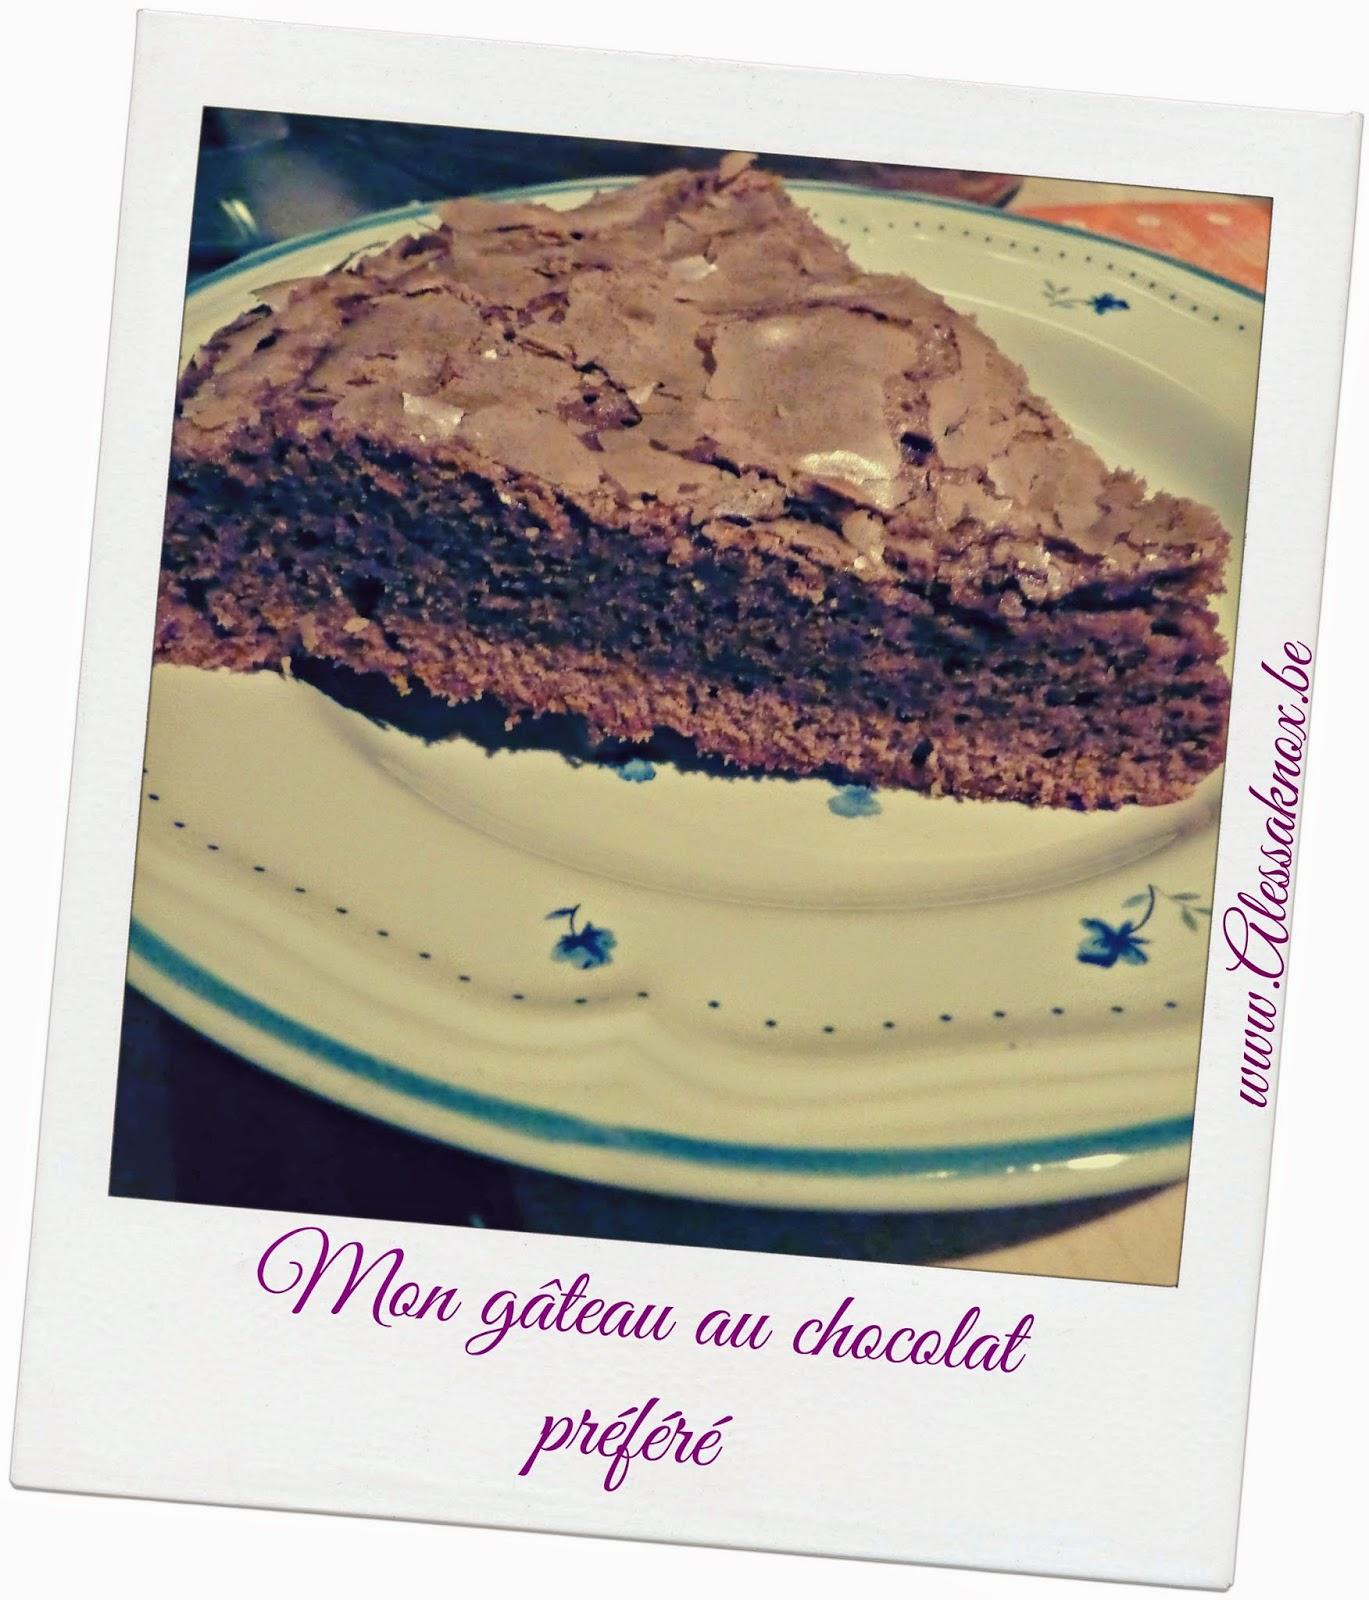 Alessaknox Blog Lifestyle Belge Mon Gateau Au Chocolat Prefere